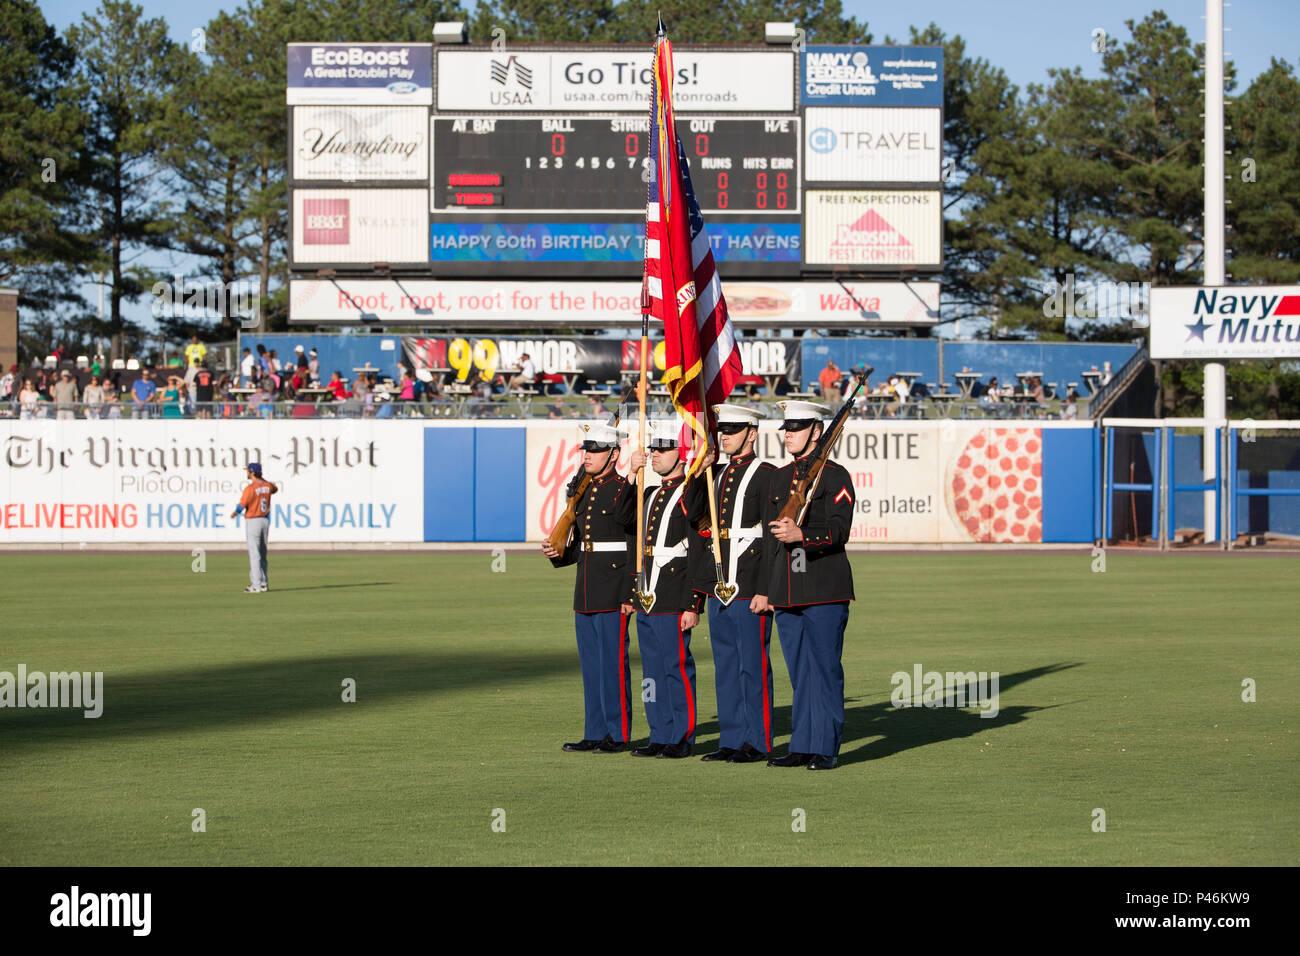 NORFOLK, Va  - Marines with U S  Marine Corps Forces Command serve